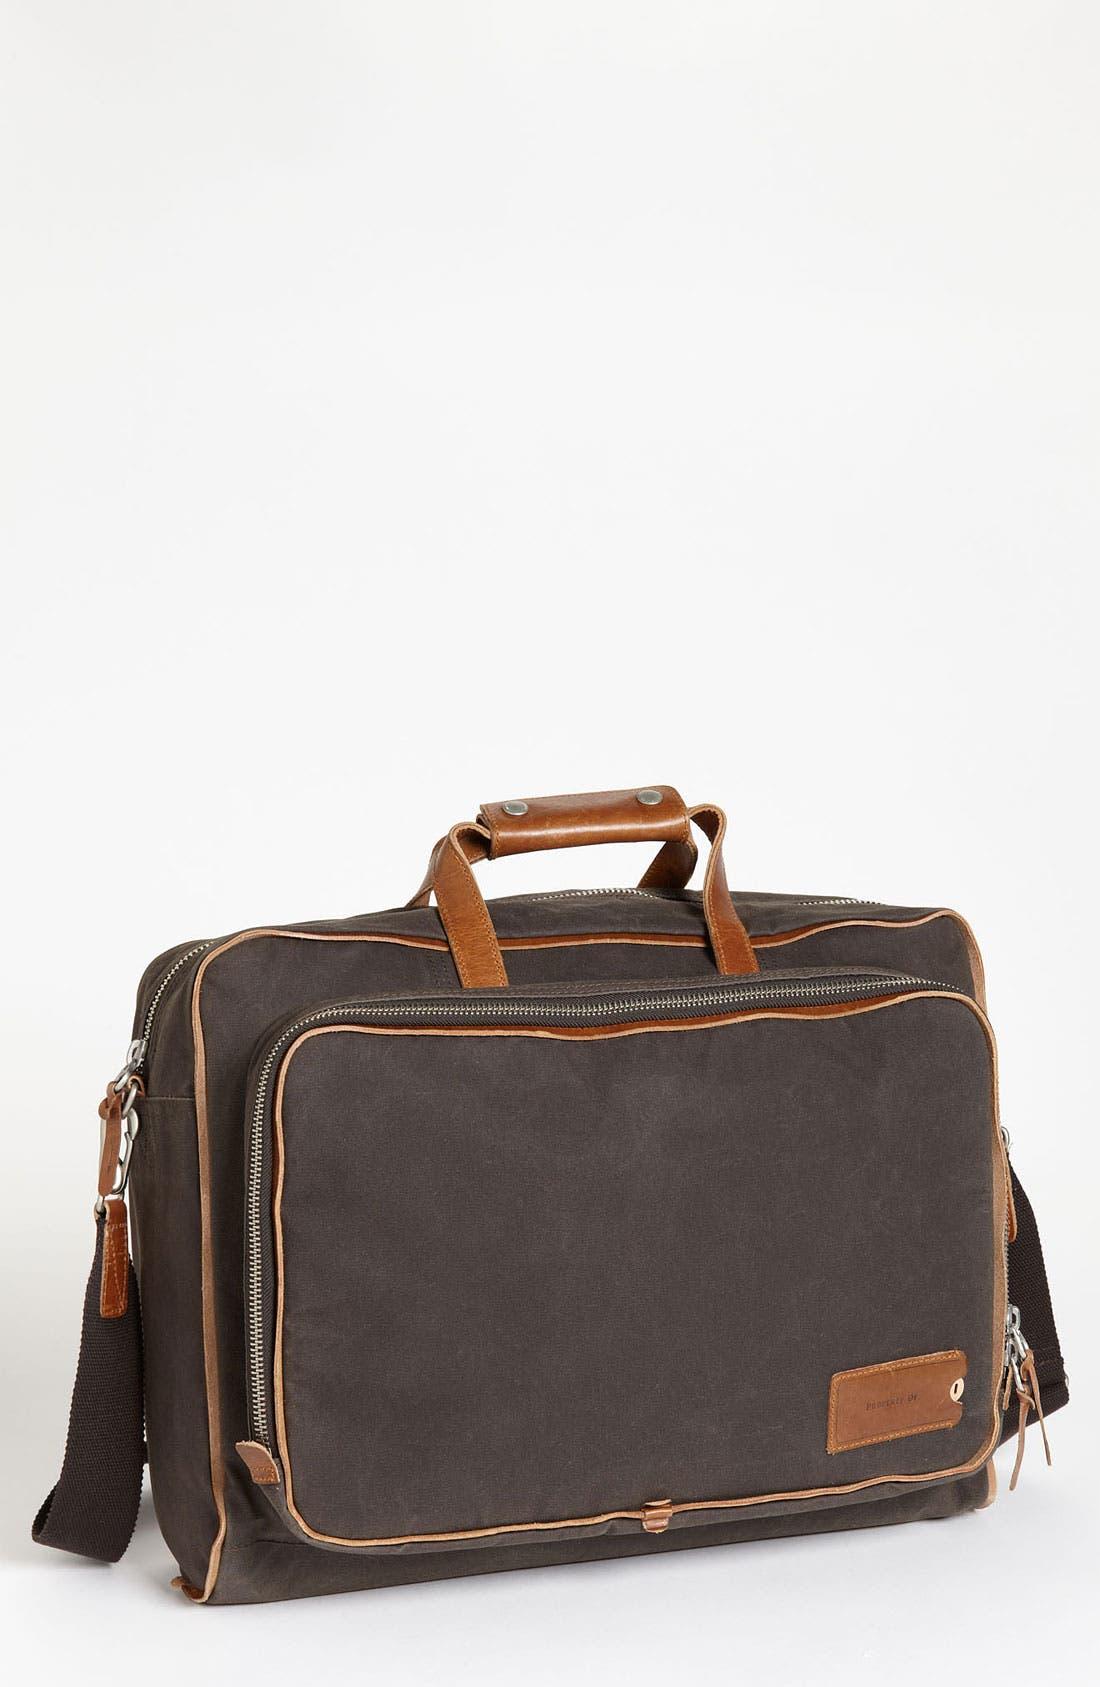 Alternate Image 1 Selected - Property Of... 'Arnald' Overnight Bag